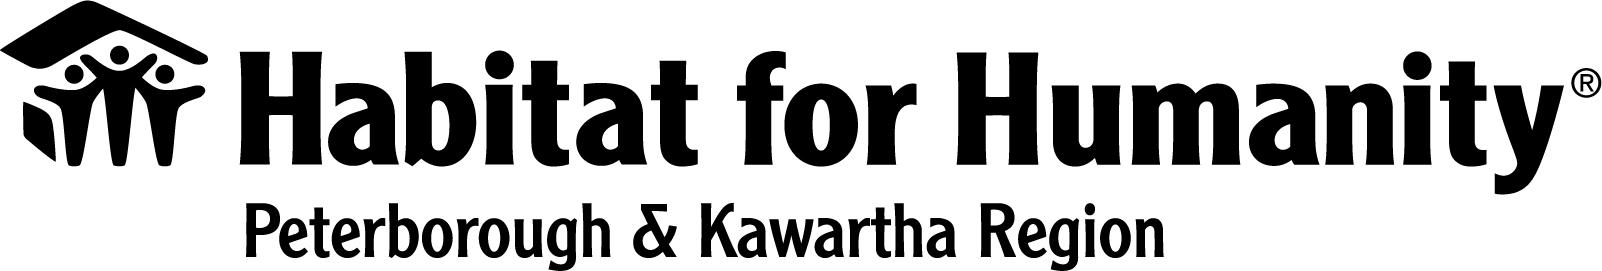 Habitat for Humanity Peterborough & Kawartha Region